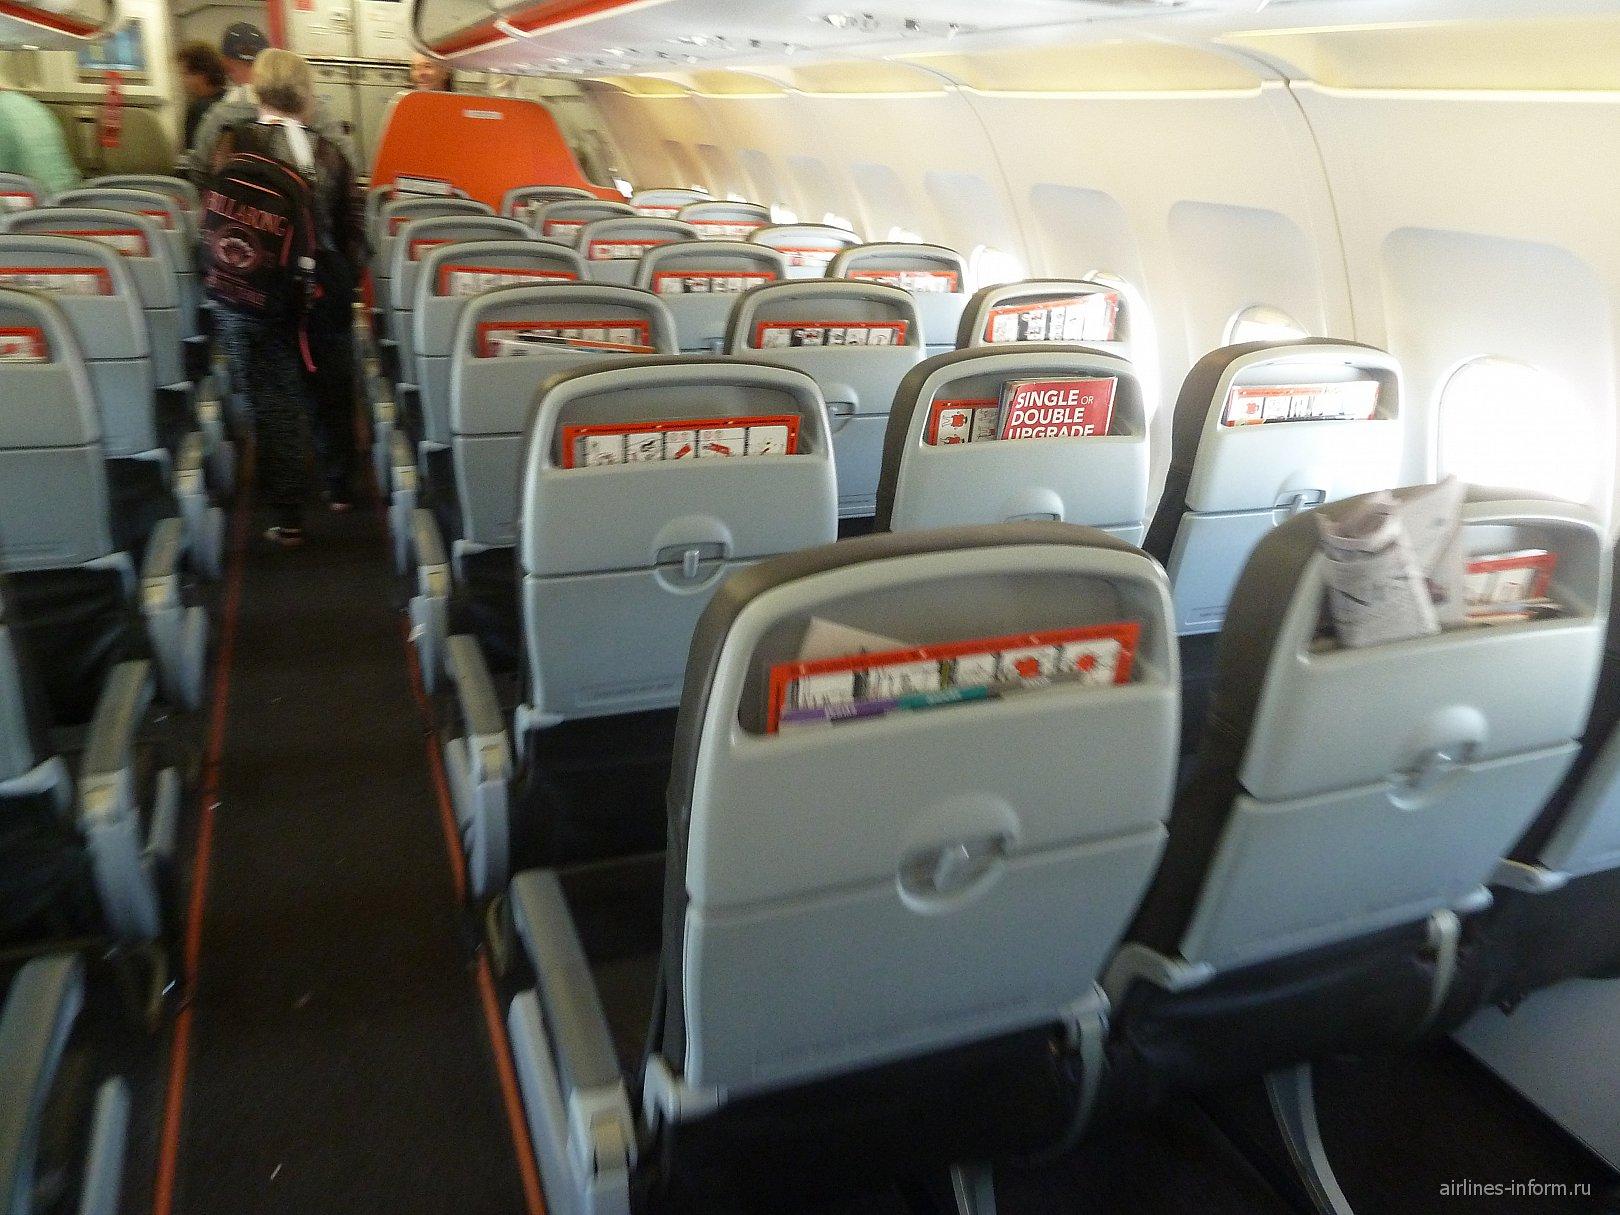 Салон самолета Airbus A320 авиакомпании JetStar Airways